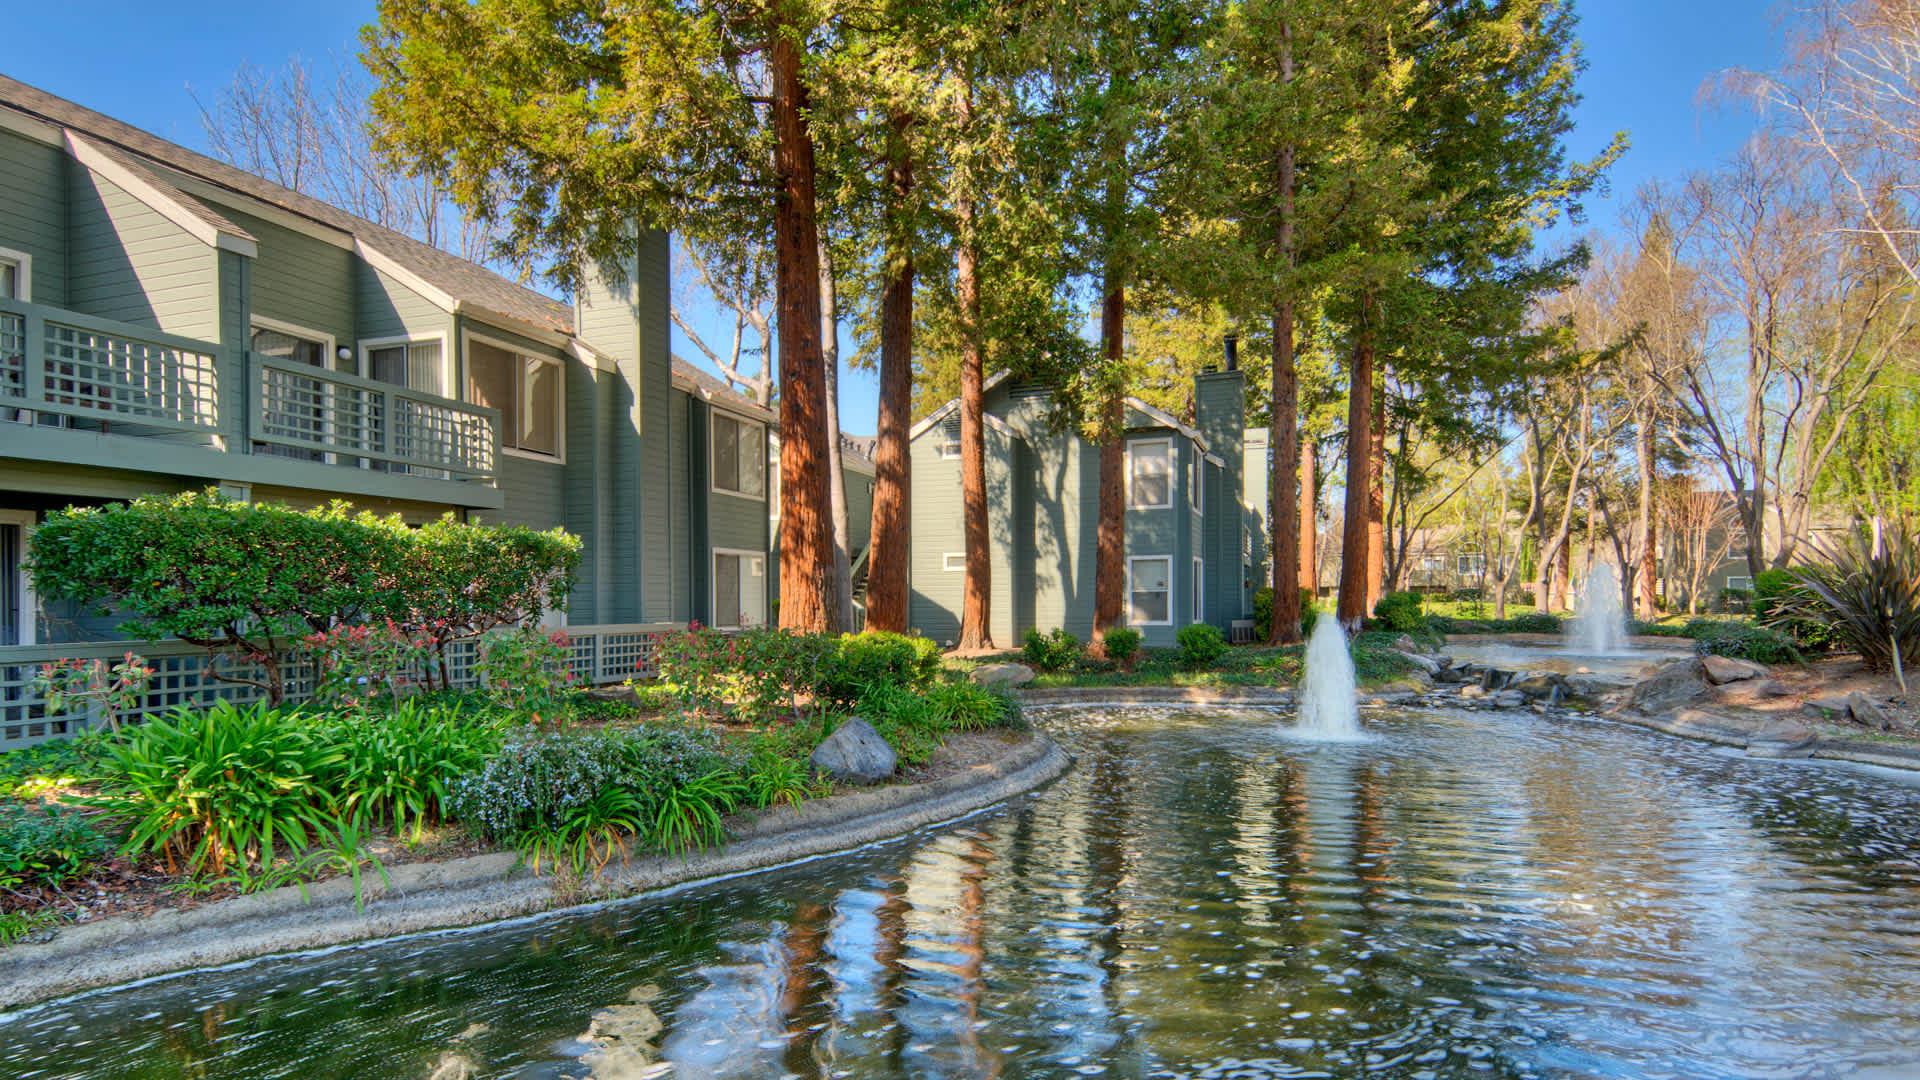 Wood Creek Furnished Apartment-Sample Image of Pleasant Hill CA Intern Rental